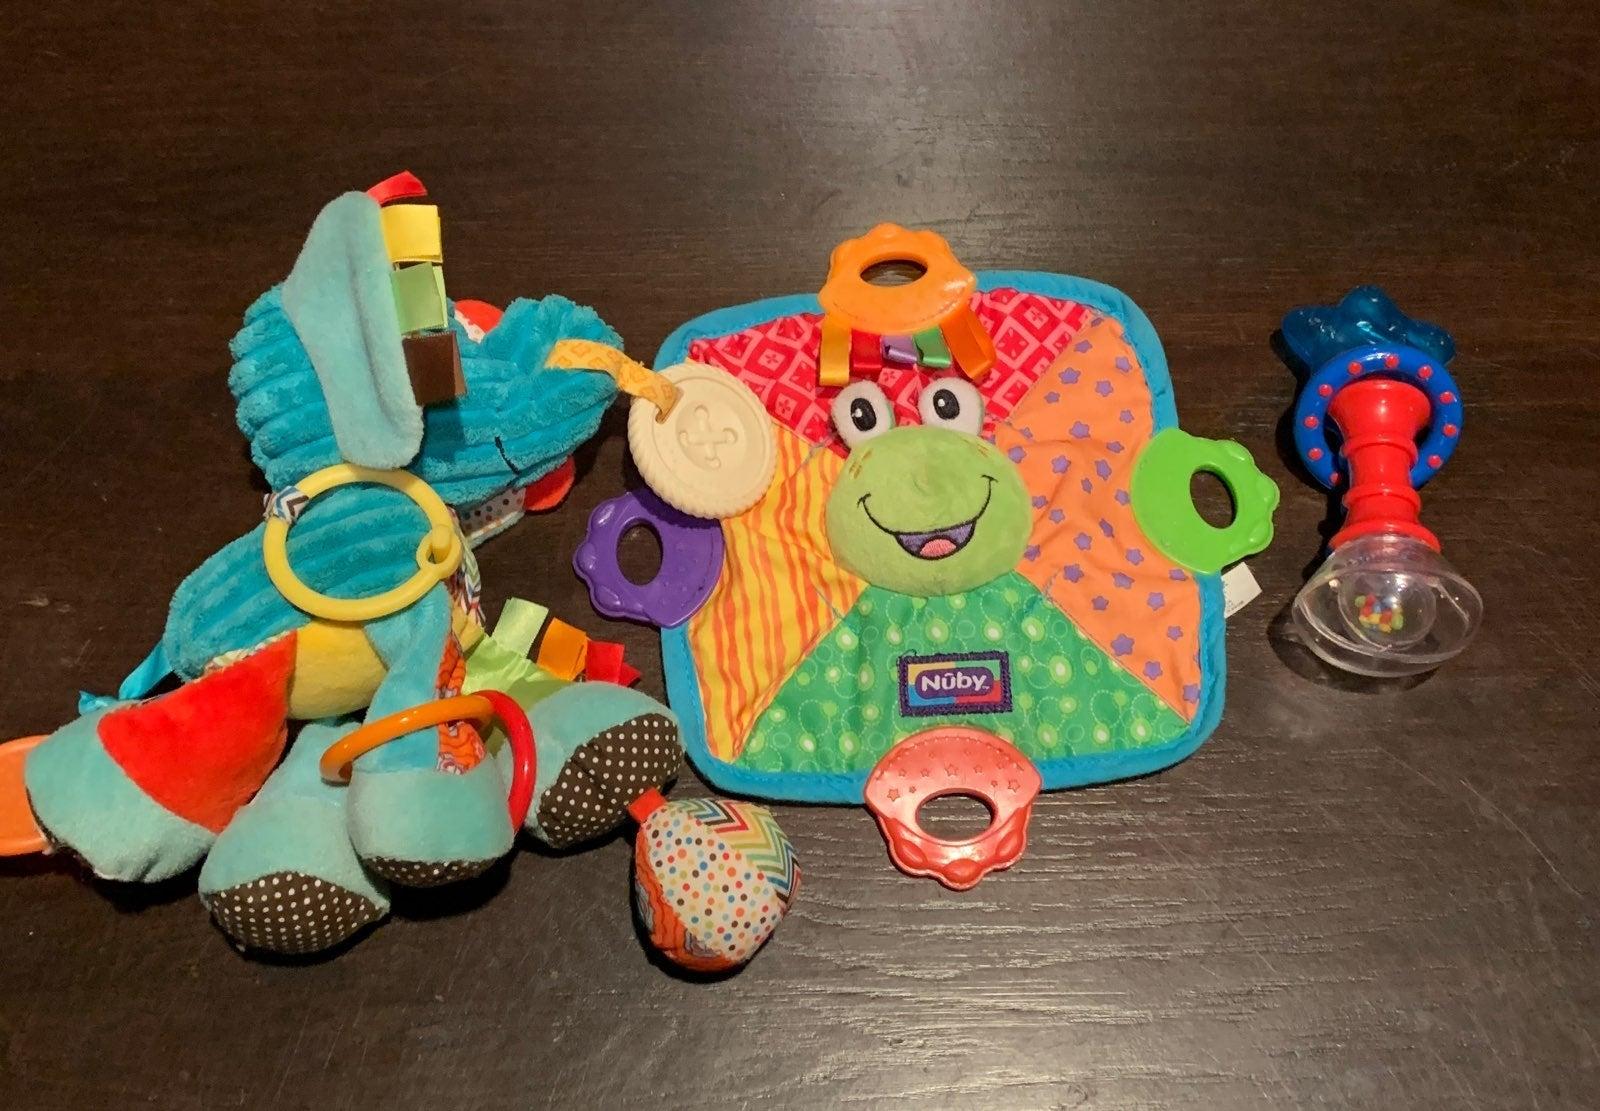 Teething/Plush Sensory Baby Toy Bundle